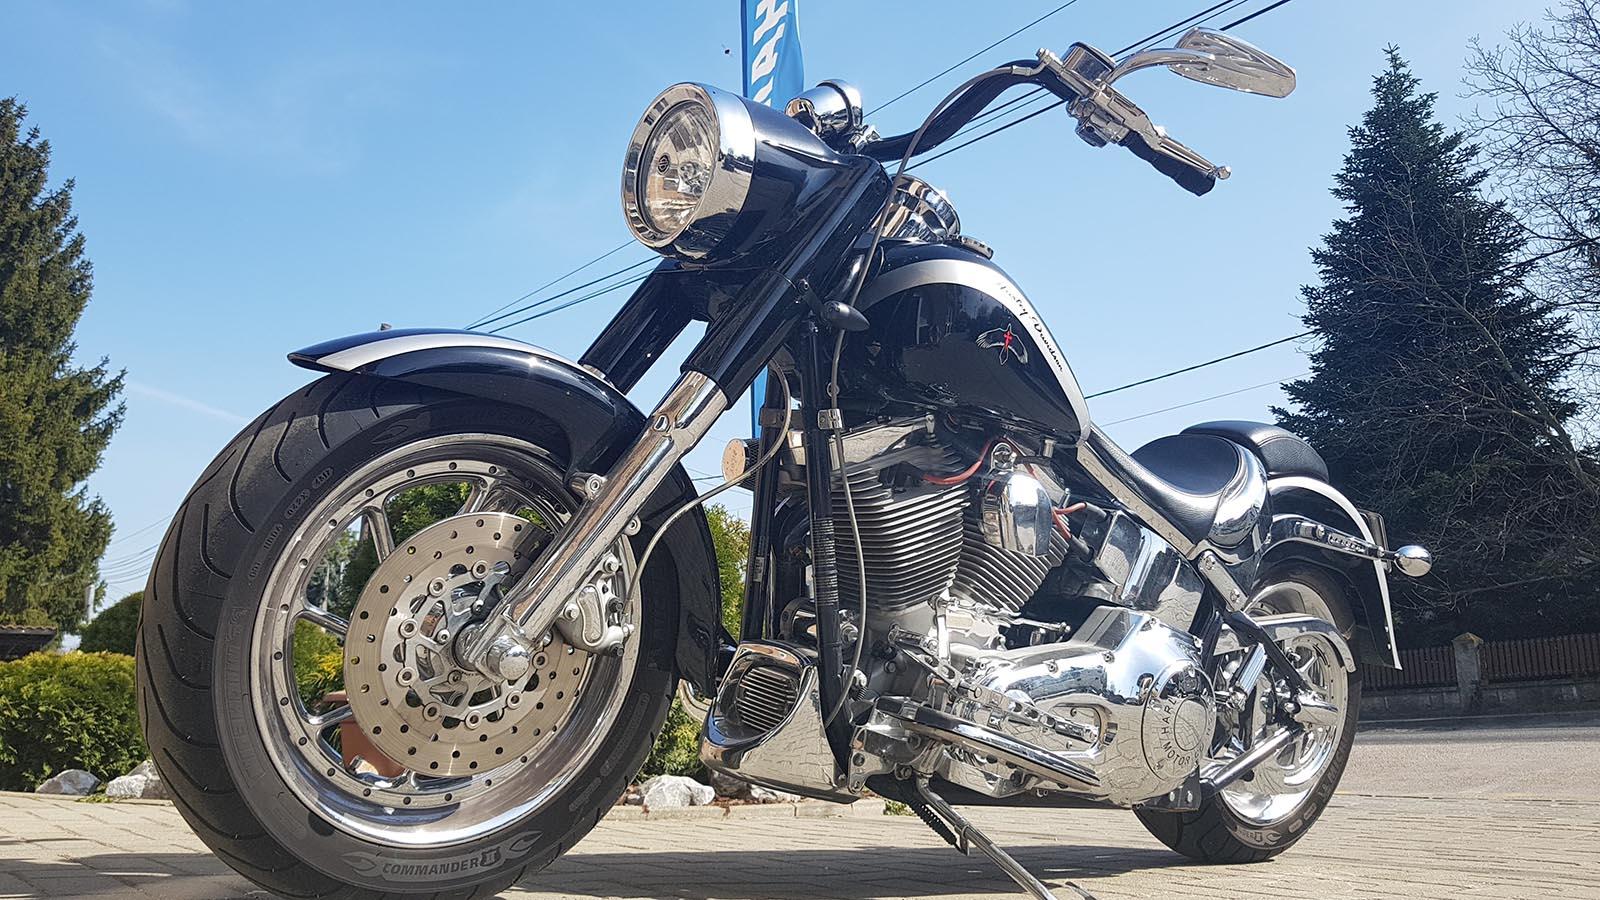 Harley Davidson csizma – Motorosbizományi